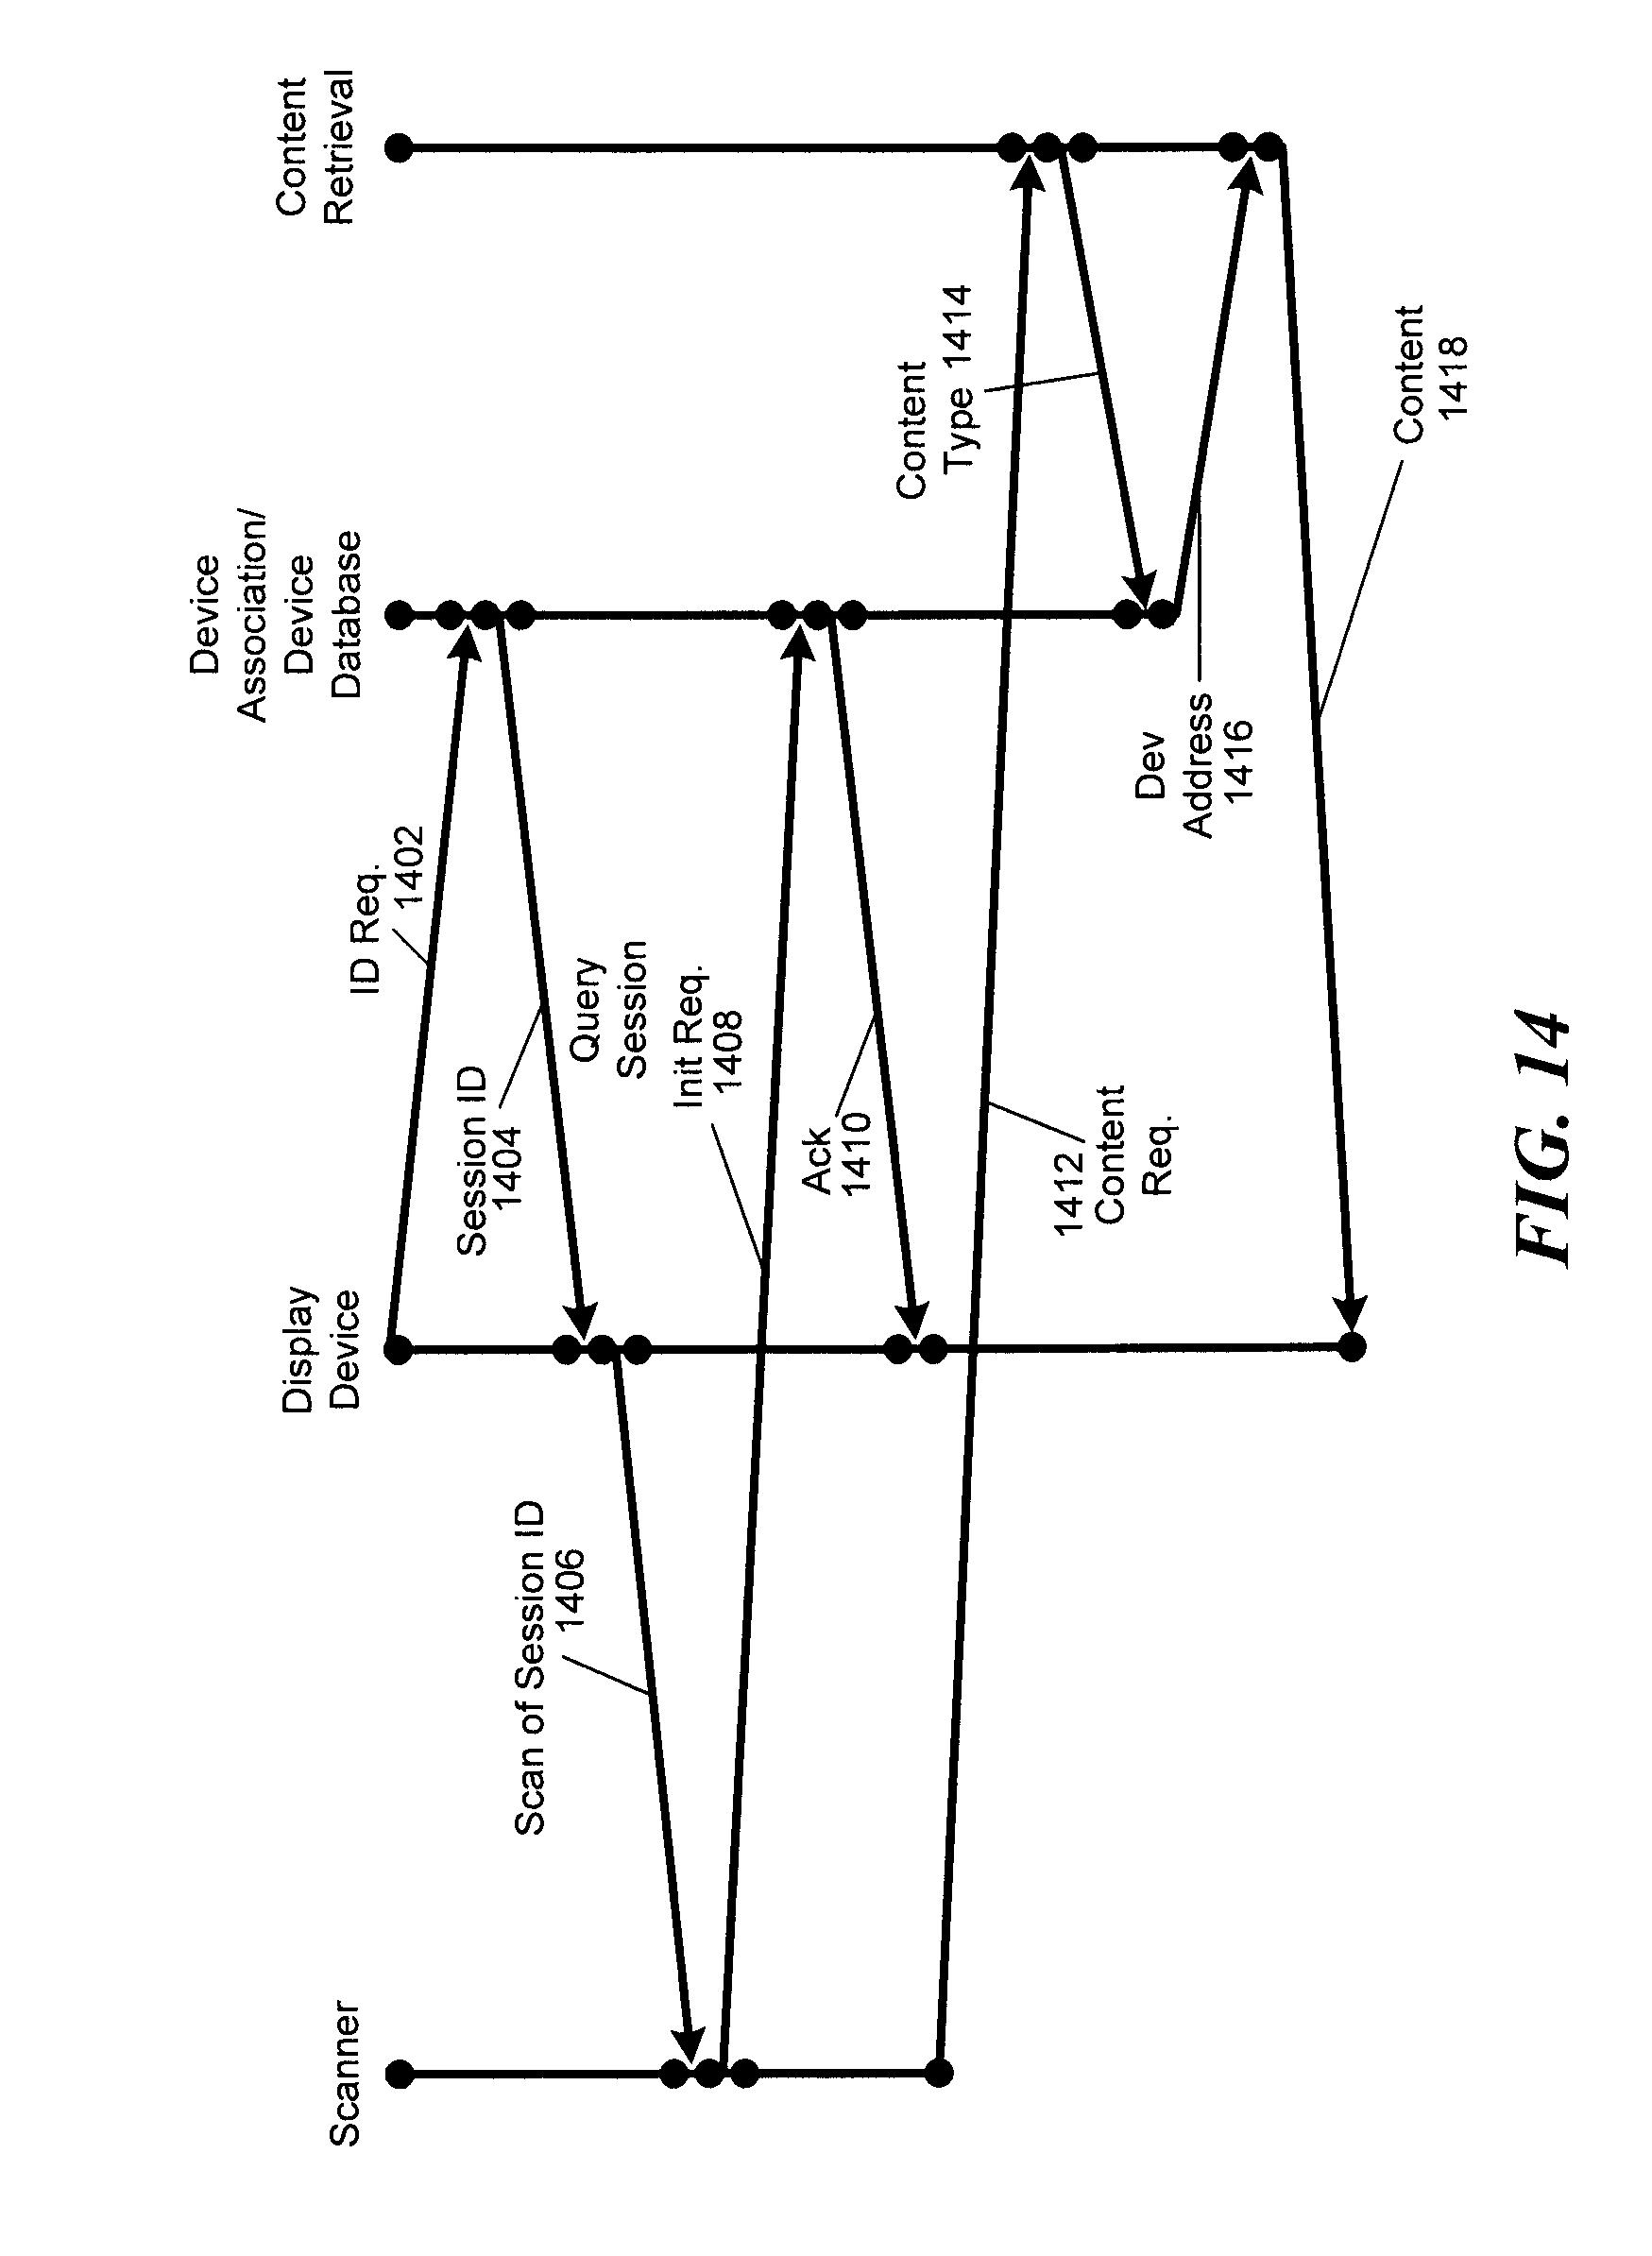 Patent US 8,447,144 B2